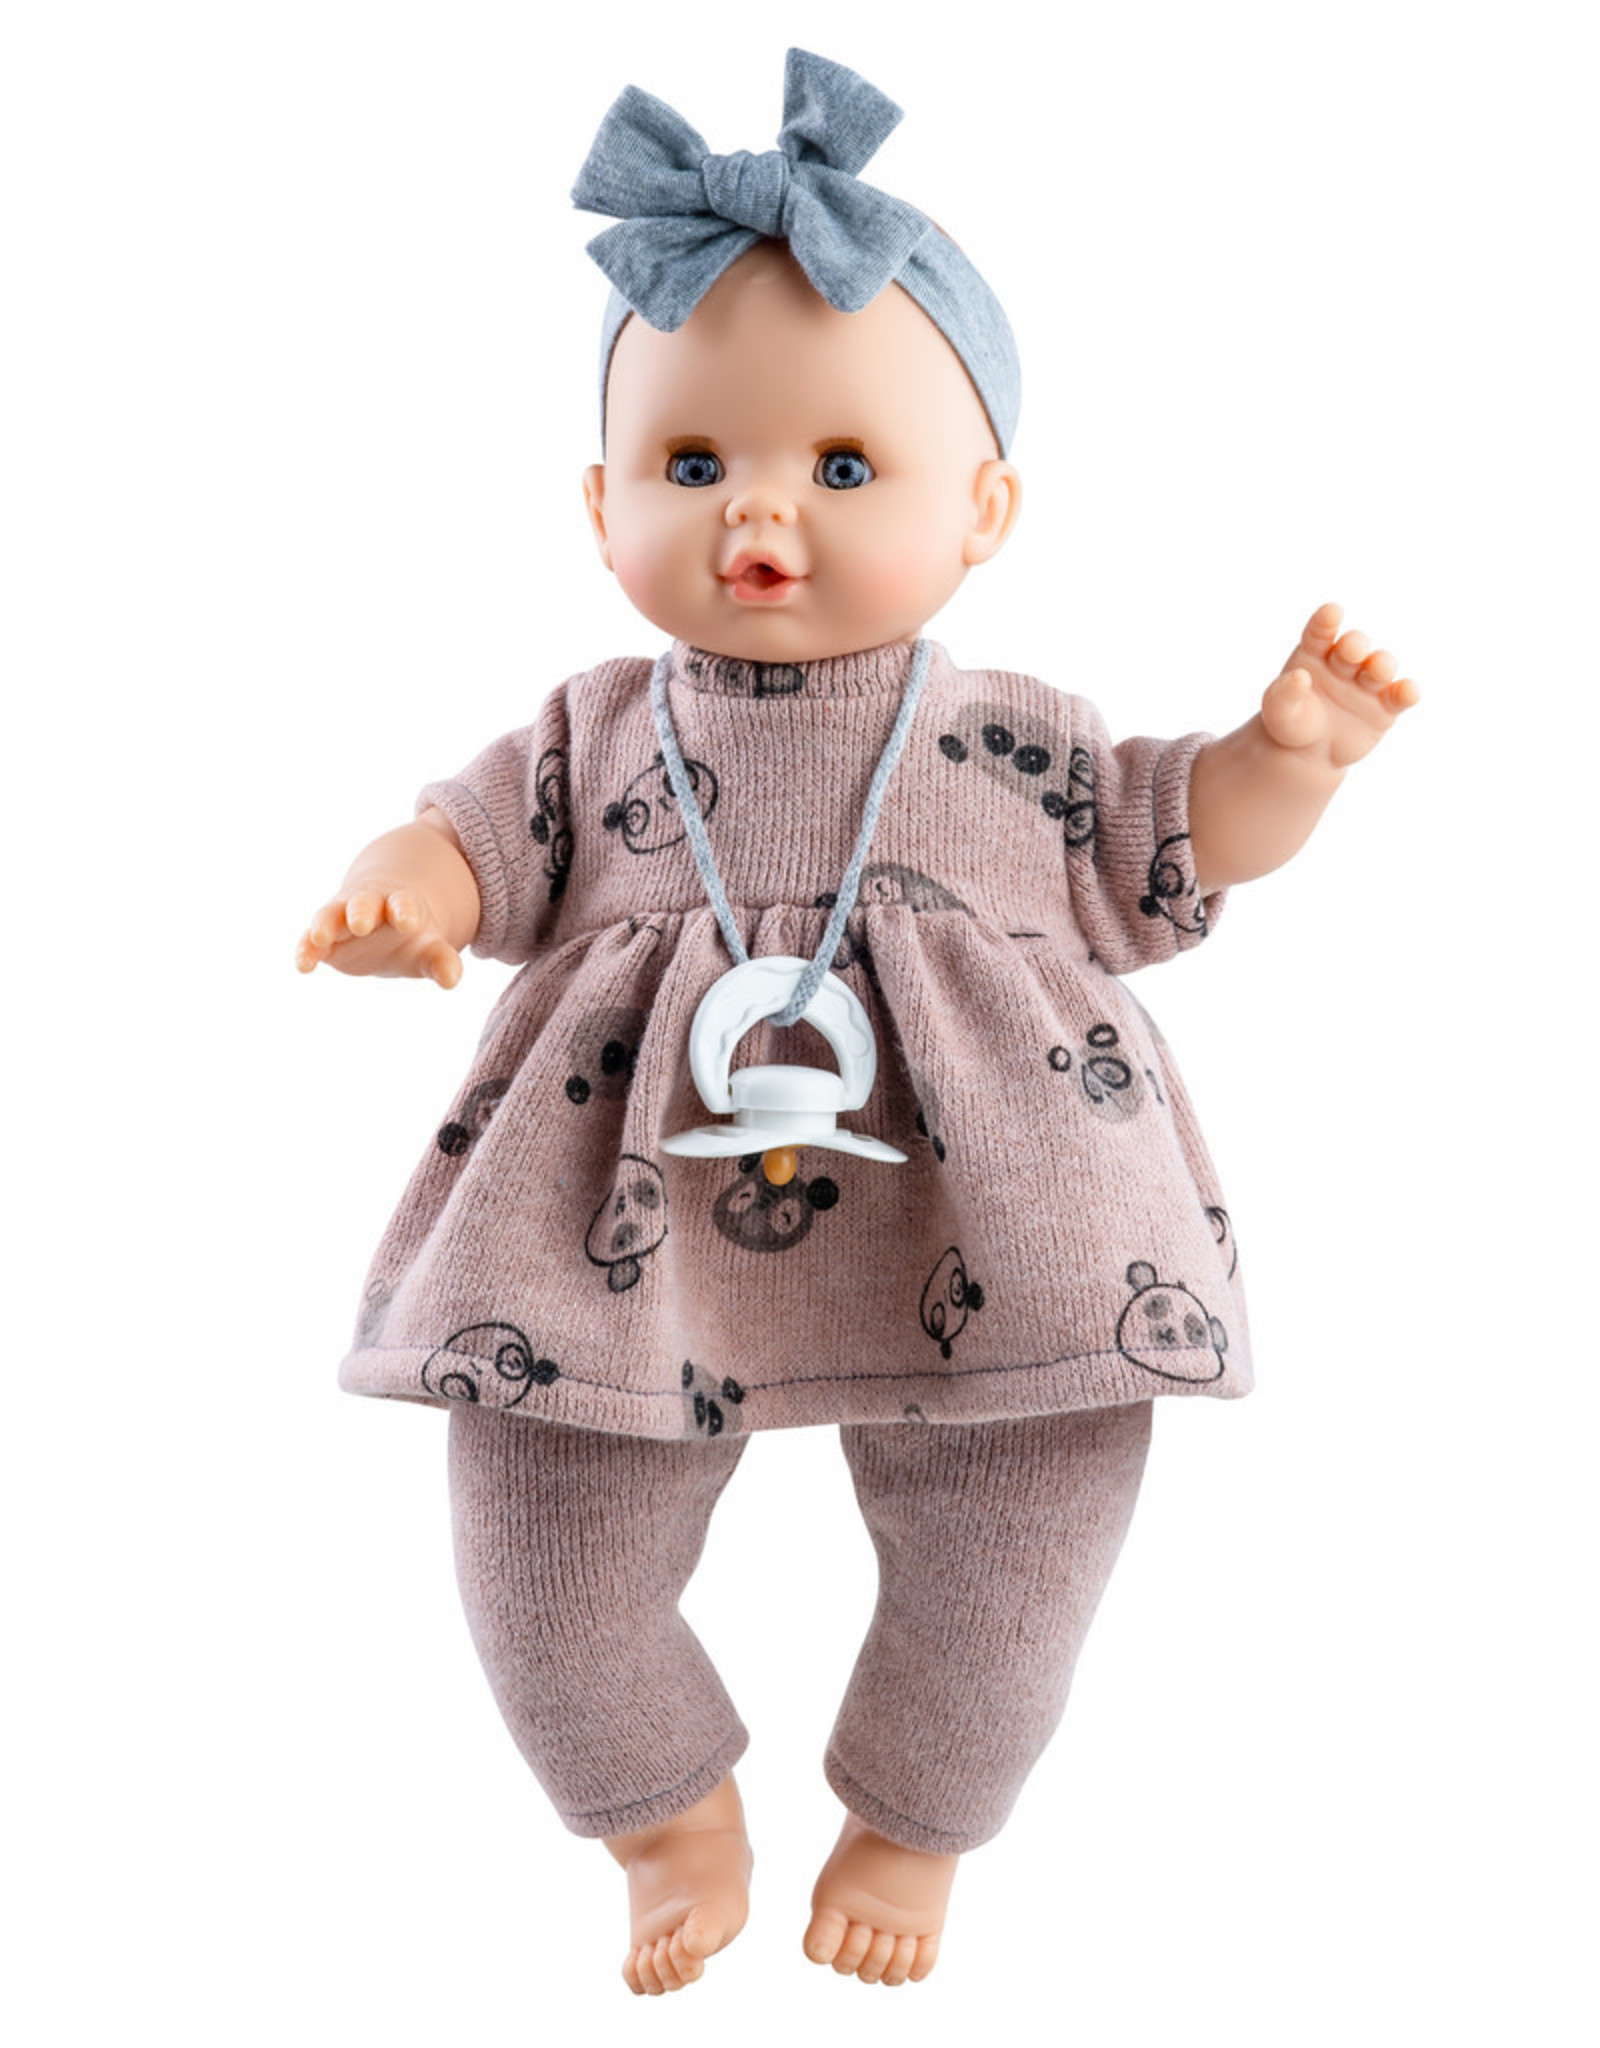 Paola Reina Baby Sonia doll